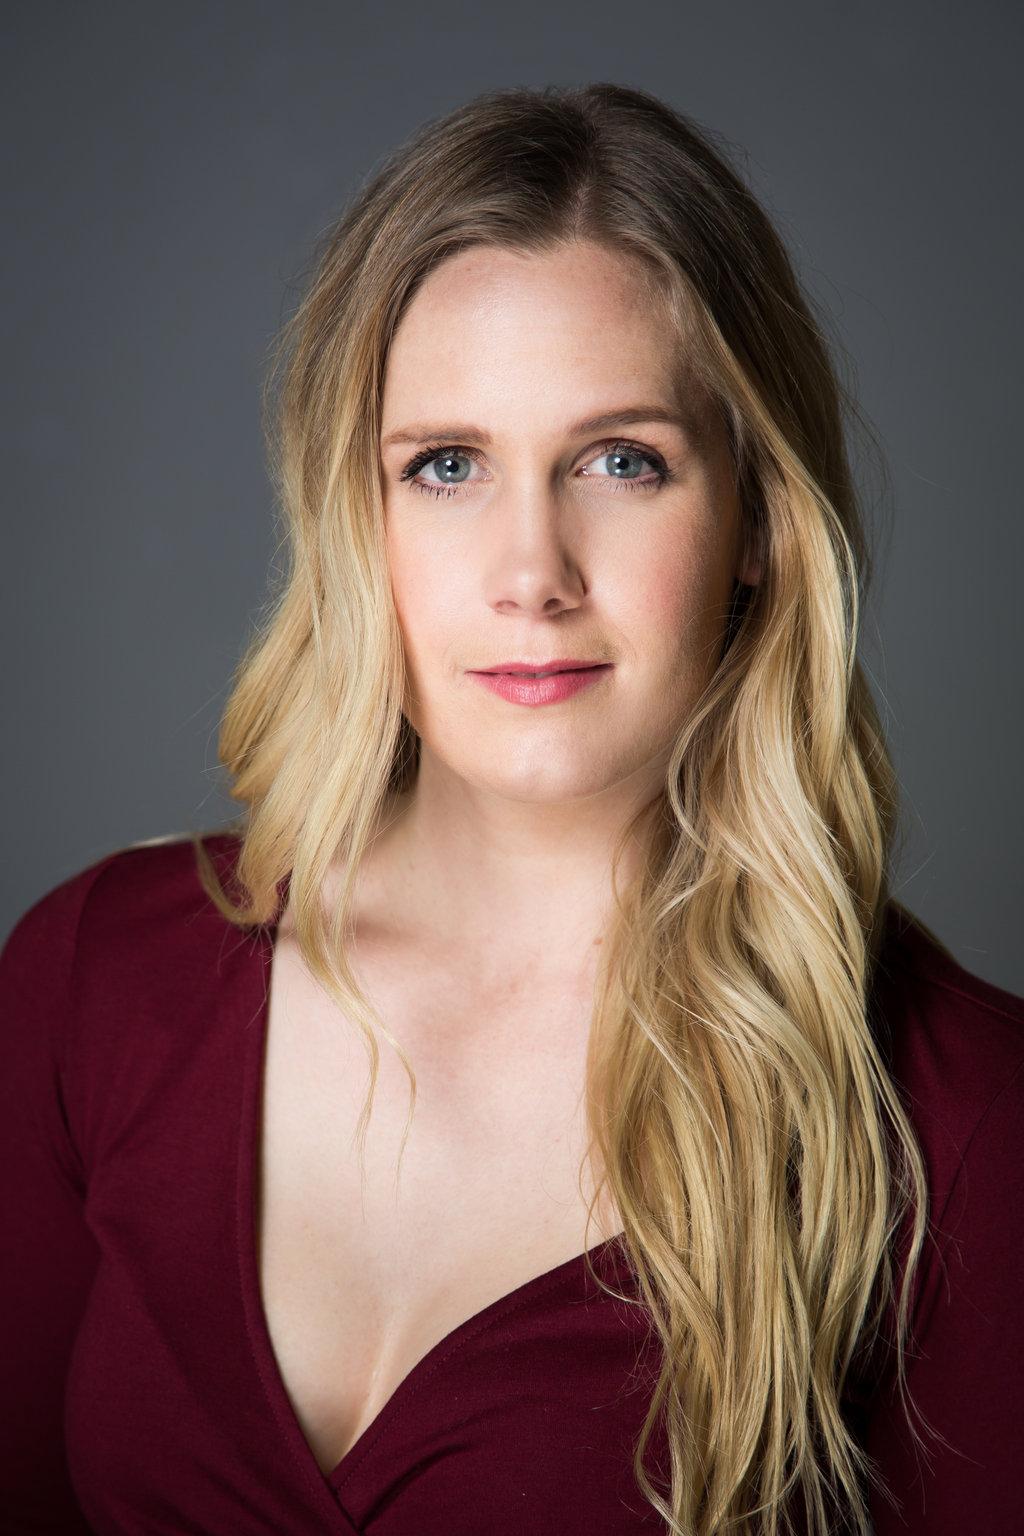 Danielle O'Malley